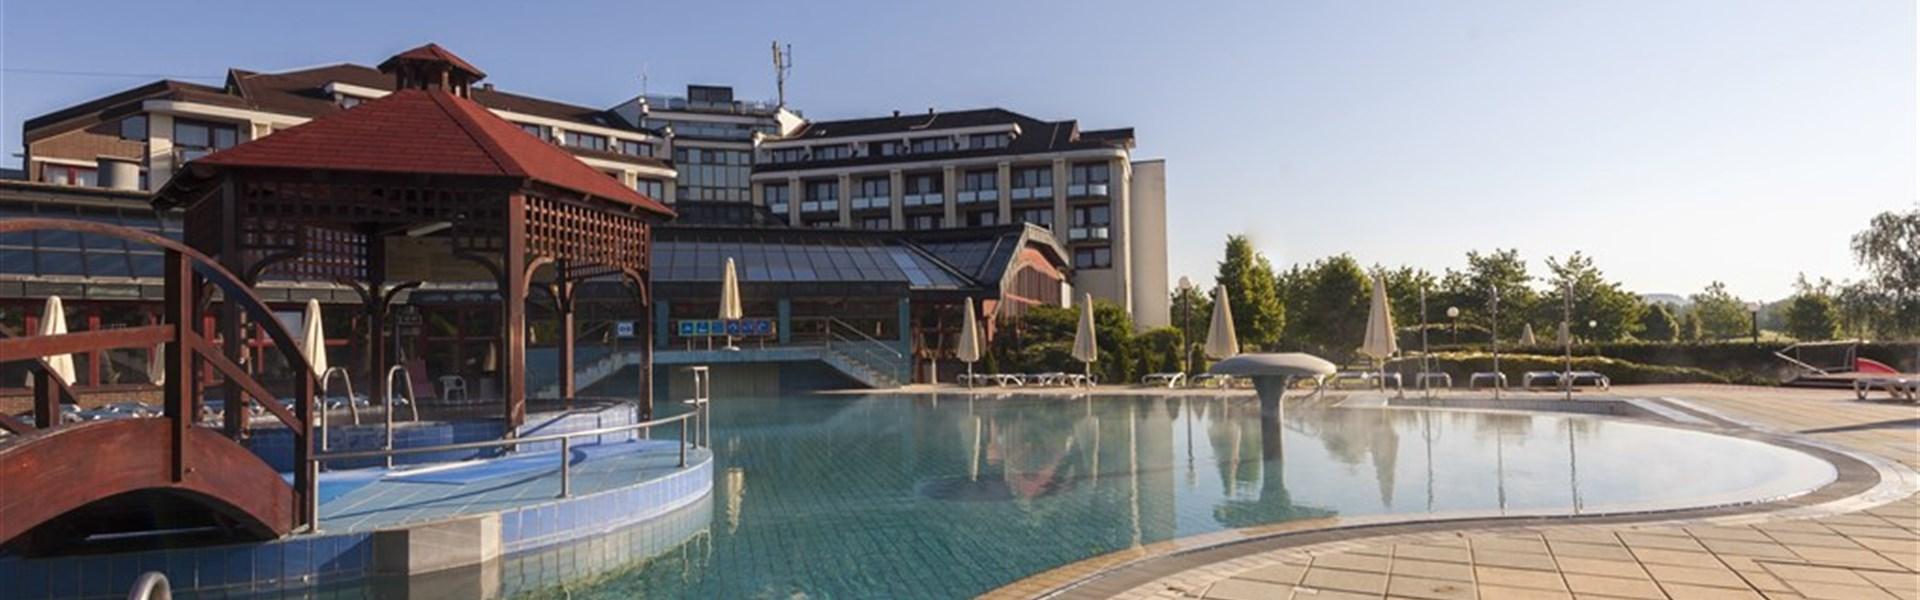 Hotel Ajda (Terme 3000) - léto 2021 -